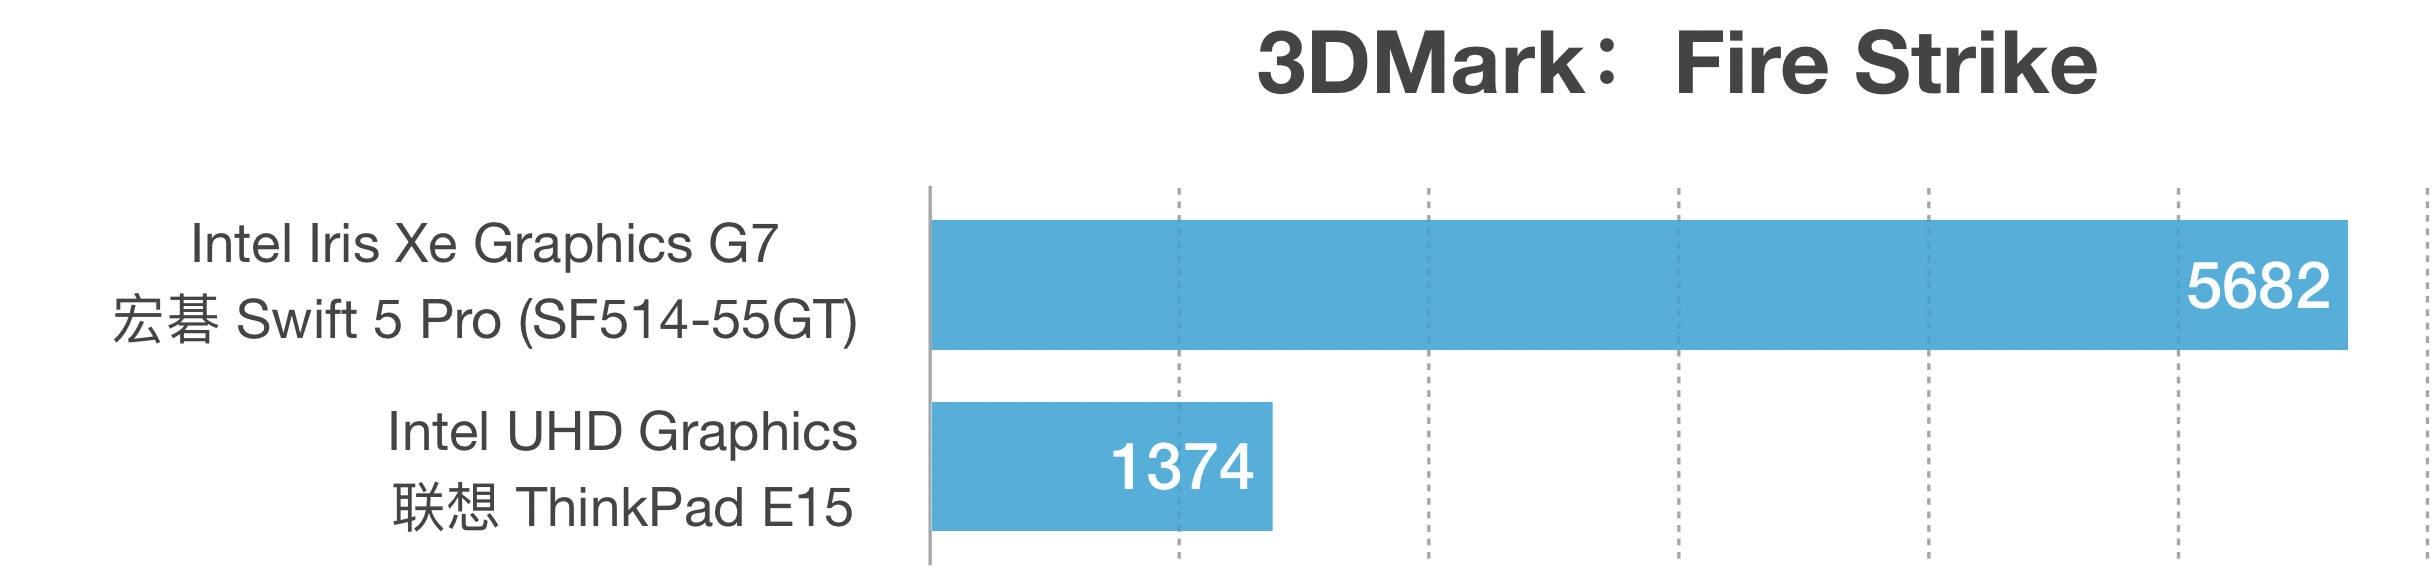 Iris Xe Graphics G7和UHD Graphics性能跑分对比评测